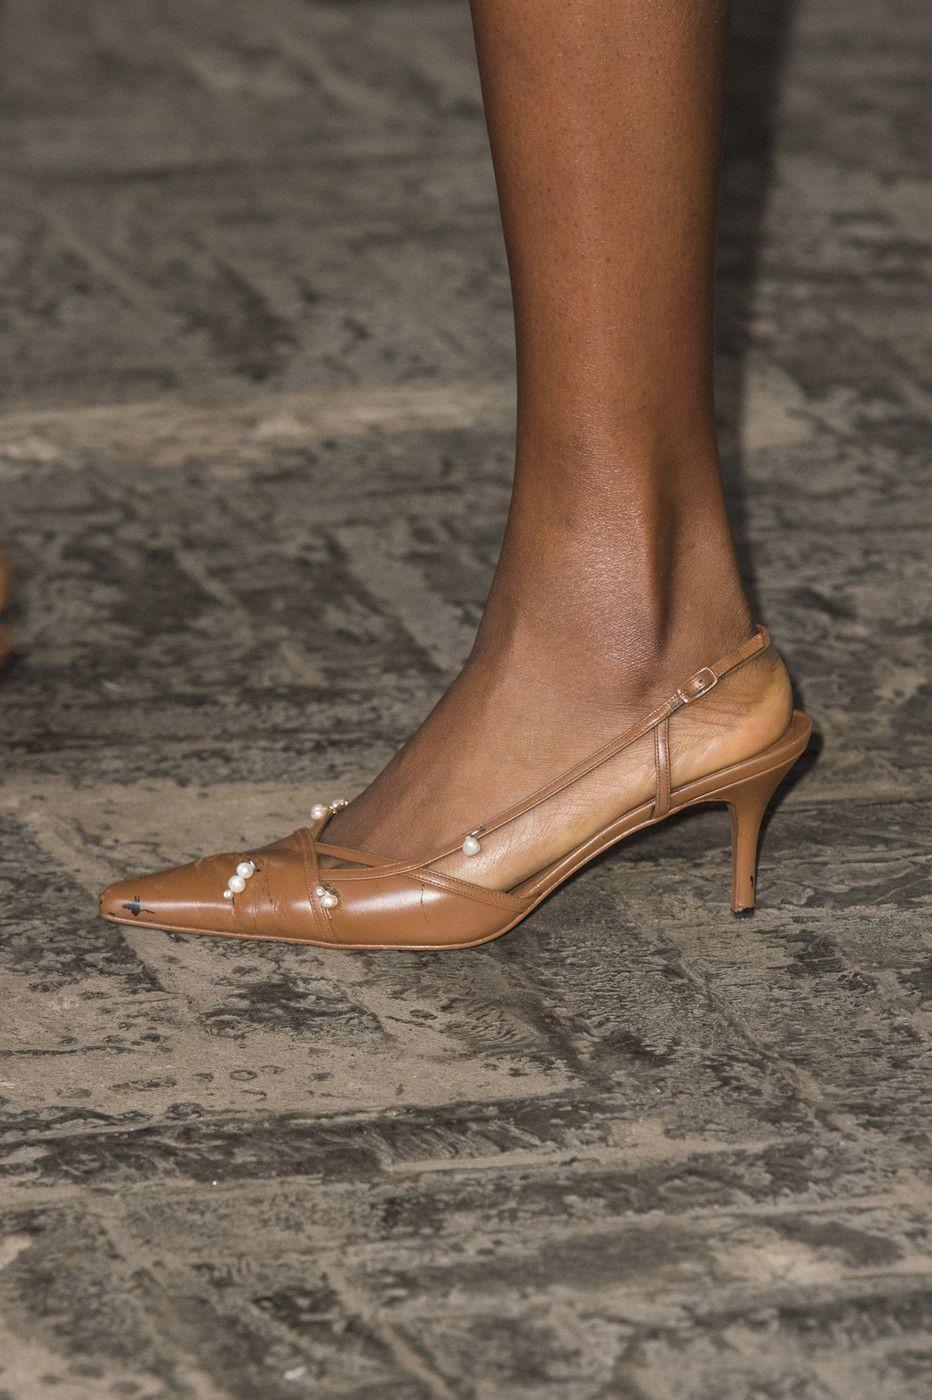 Fashion East At London Fashion Week Spring 2019 Fashion Shoes Chic Shoes Heels